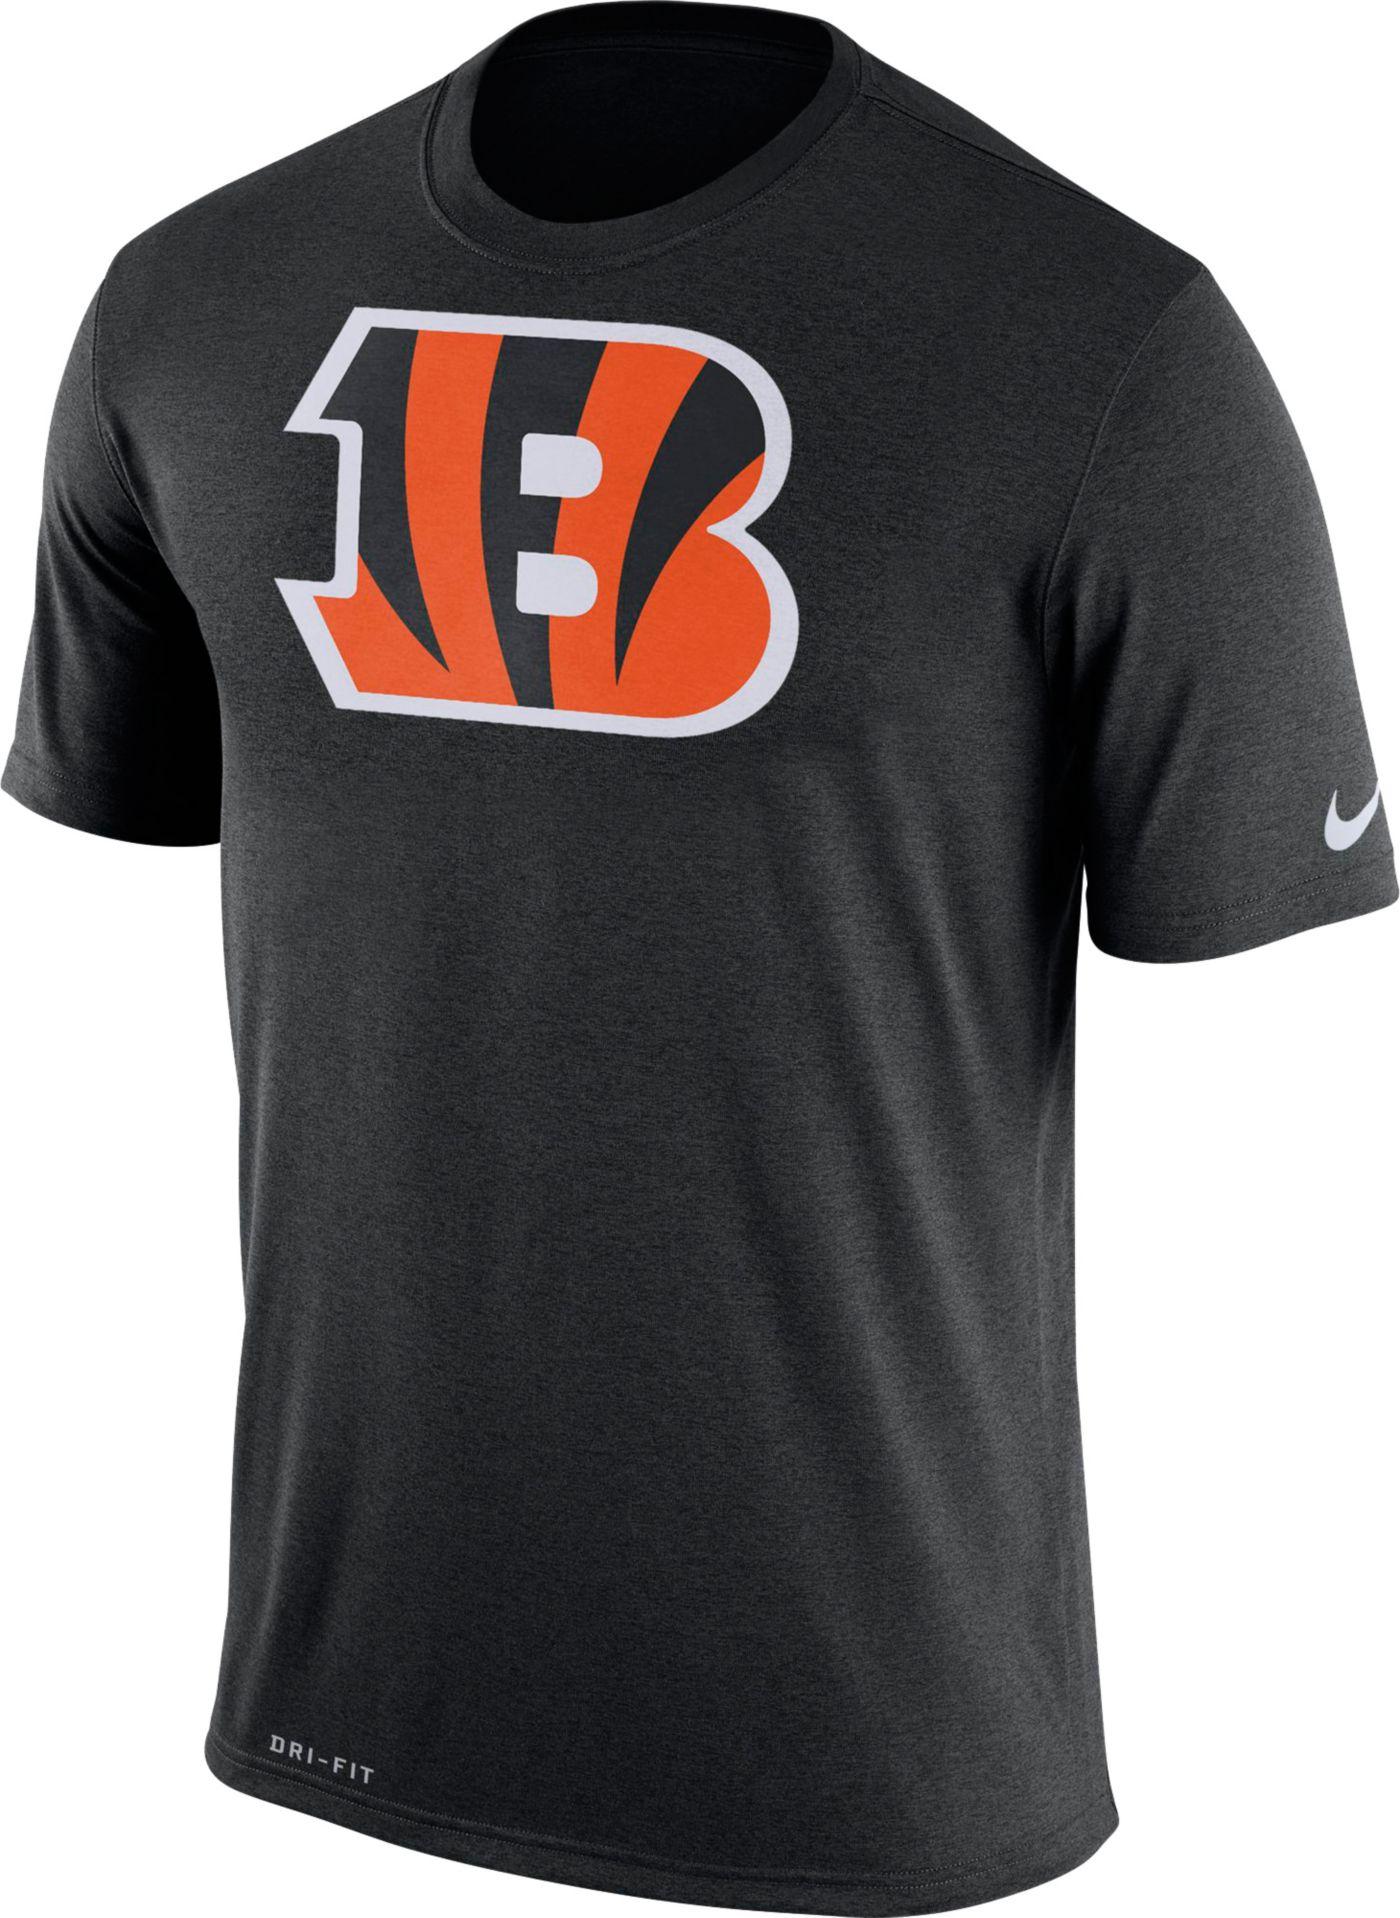 Nike Men's Cincinnati Bengals Legend Logo Black T-Shirt